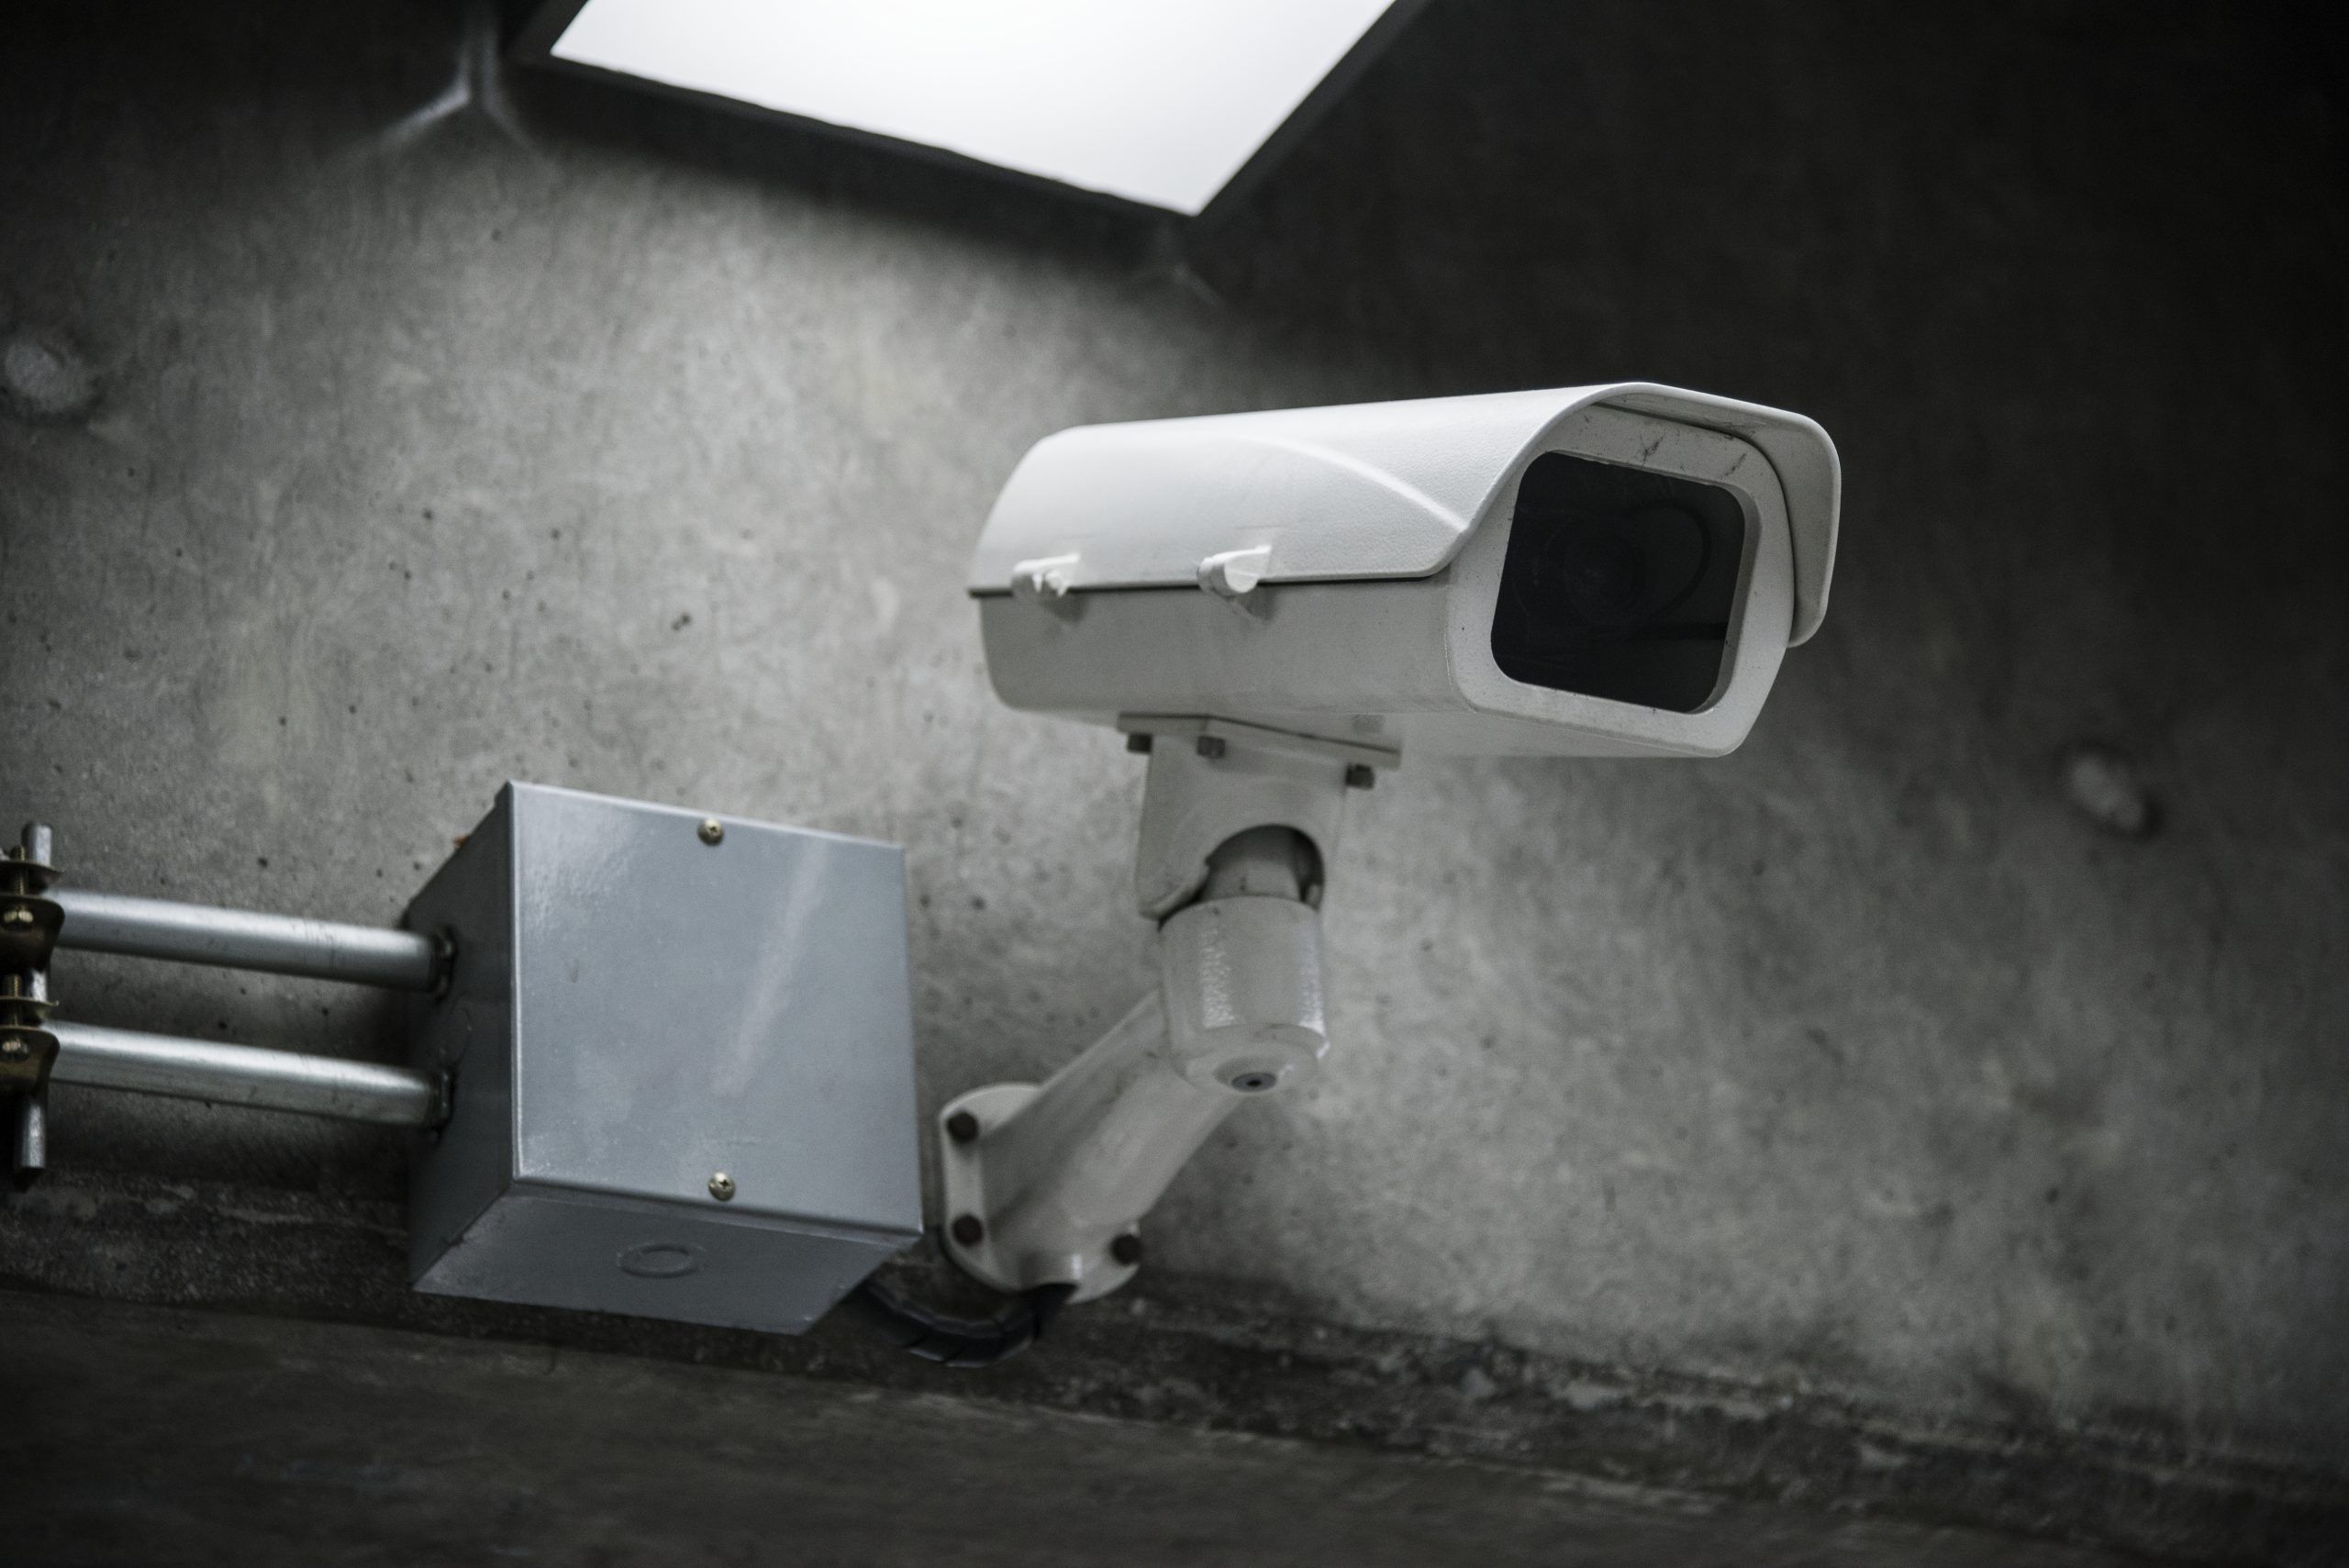 Closeup of CCTV camera on the wall